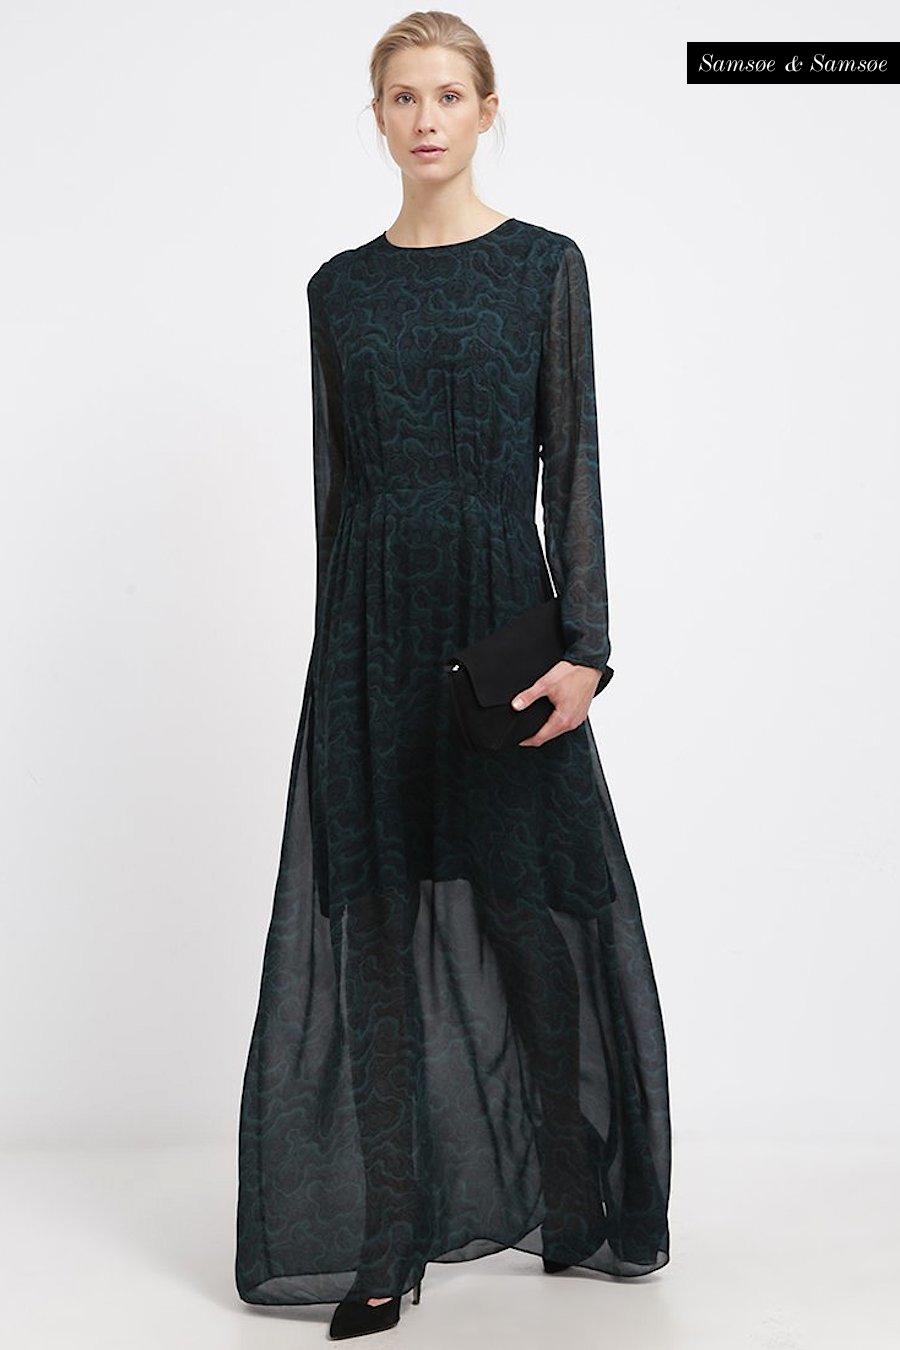 Maxi dress under 200 fash-n-chips.com 5